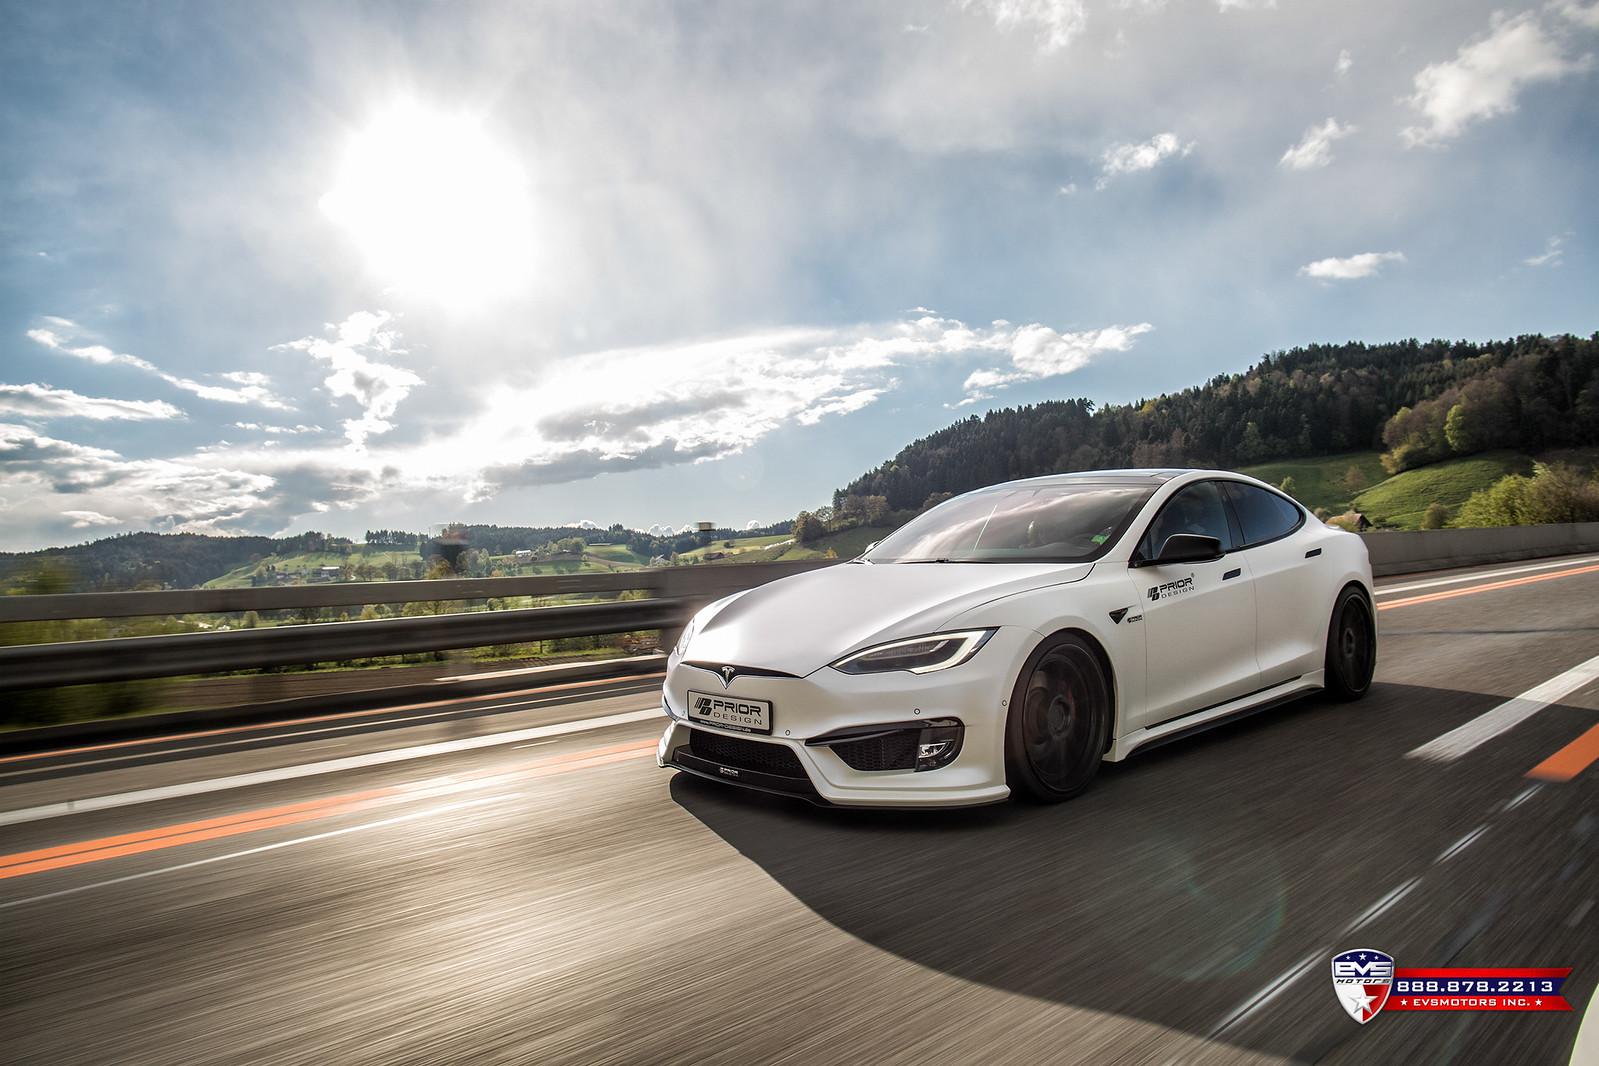 Tesla - Aerodynamic / Body Kits - EVS Motors Inc